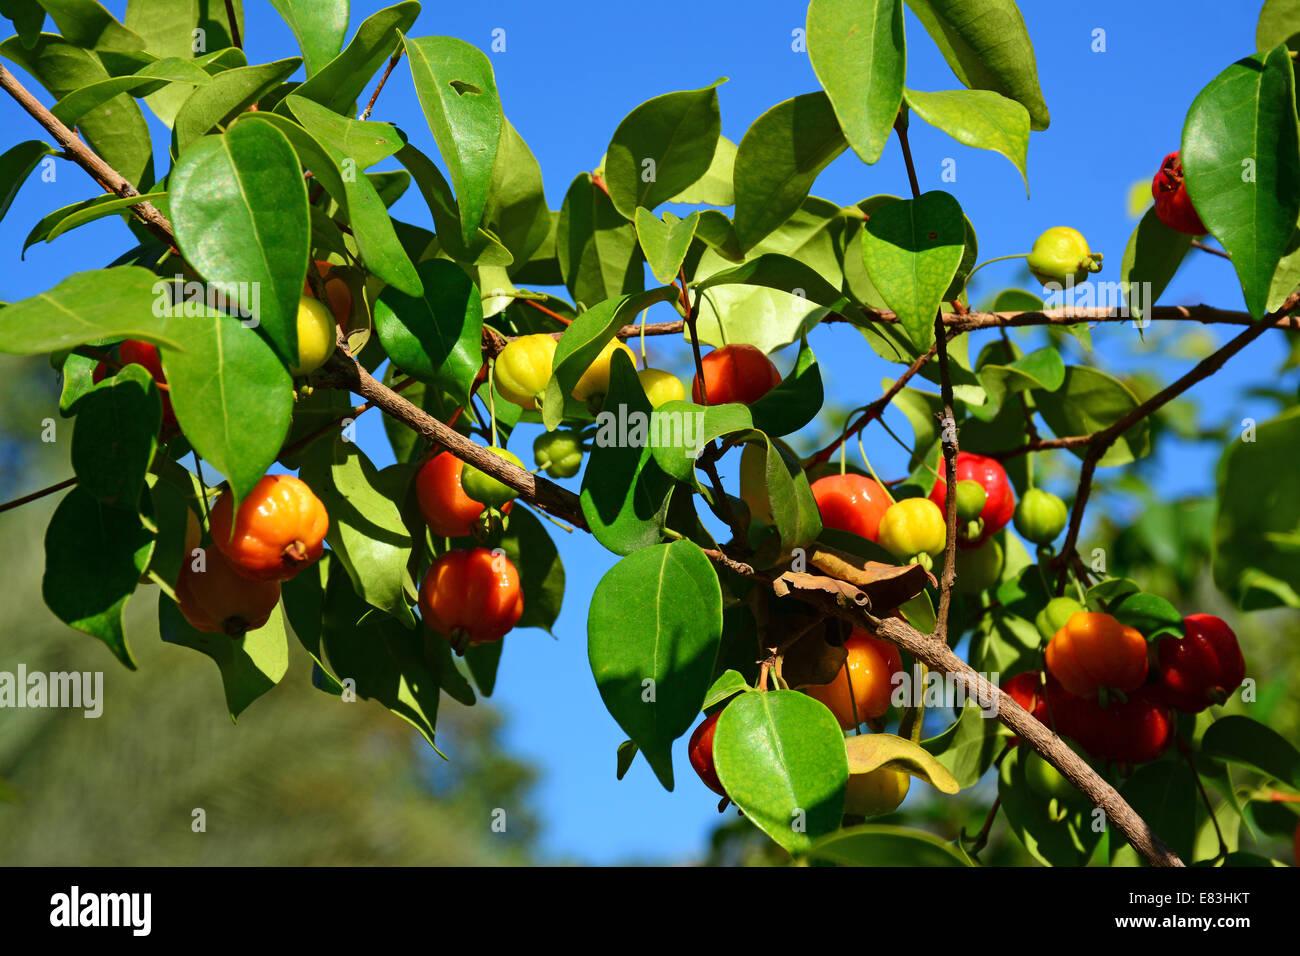 Arbre à fruits tropicaux pitanga Photo Stock